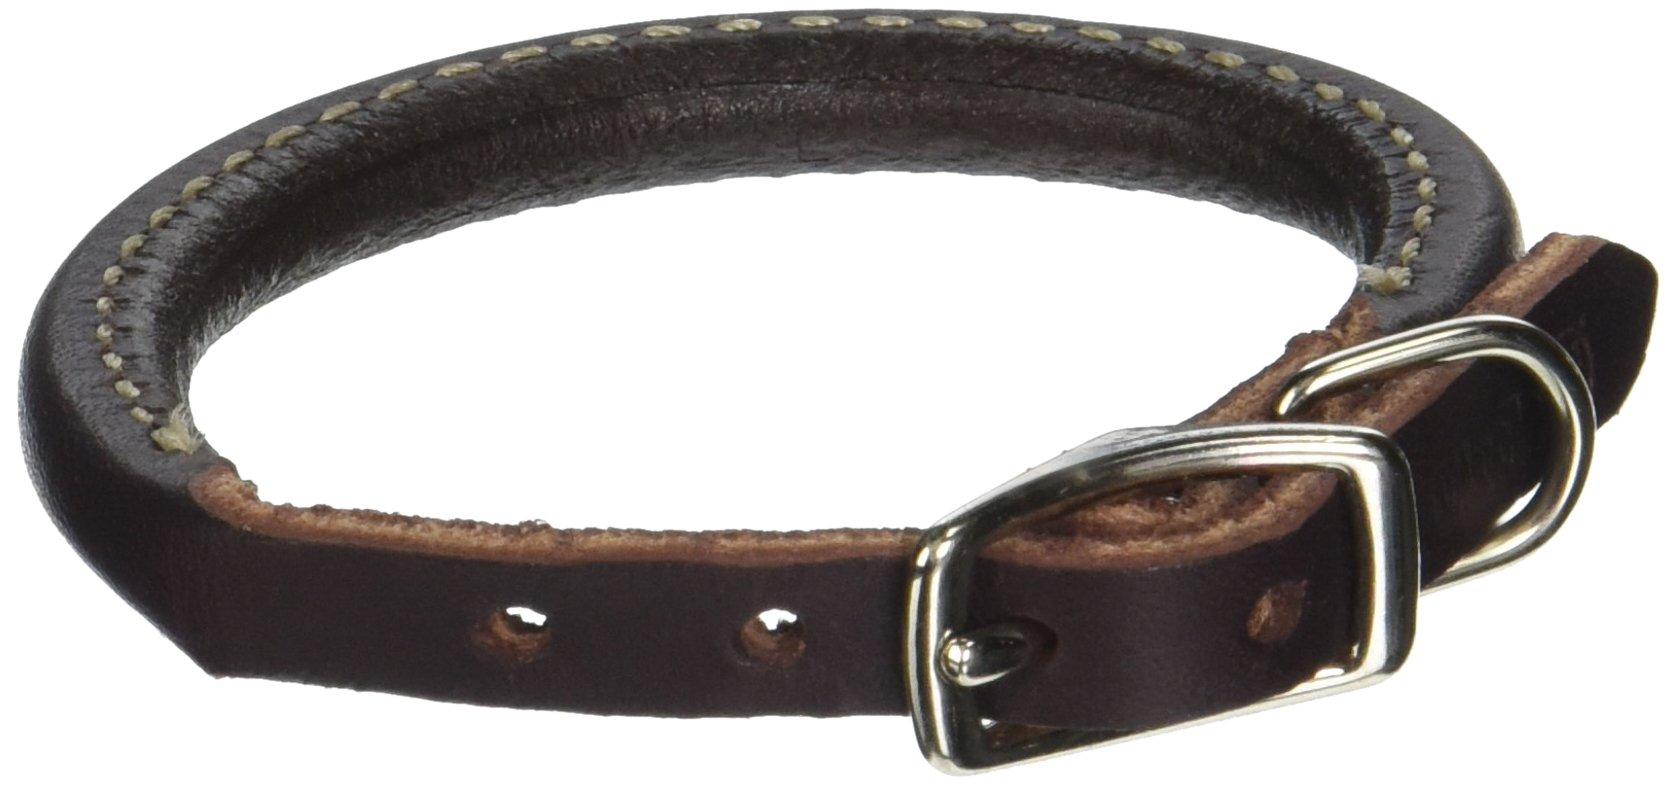 Coastal Pet Products 2203 Leather Latigo Round Dog Collar, 3/8 by 10-Inch